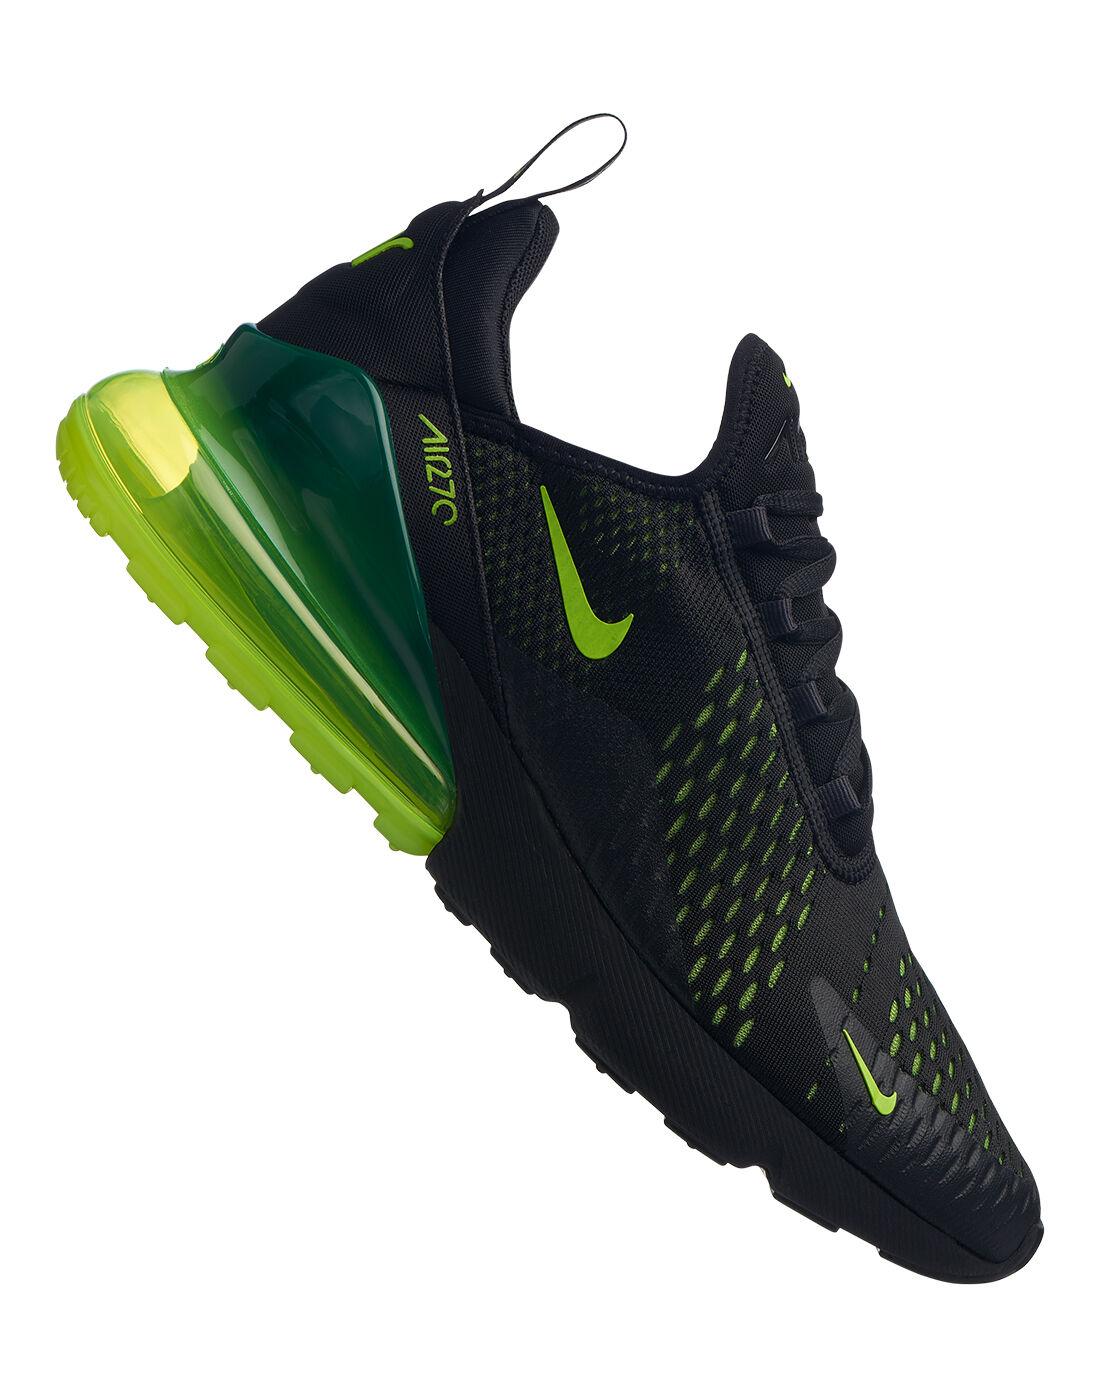 Men's Black & Neon Green Nike Air Max 270 | Life Style Sports